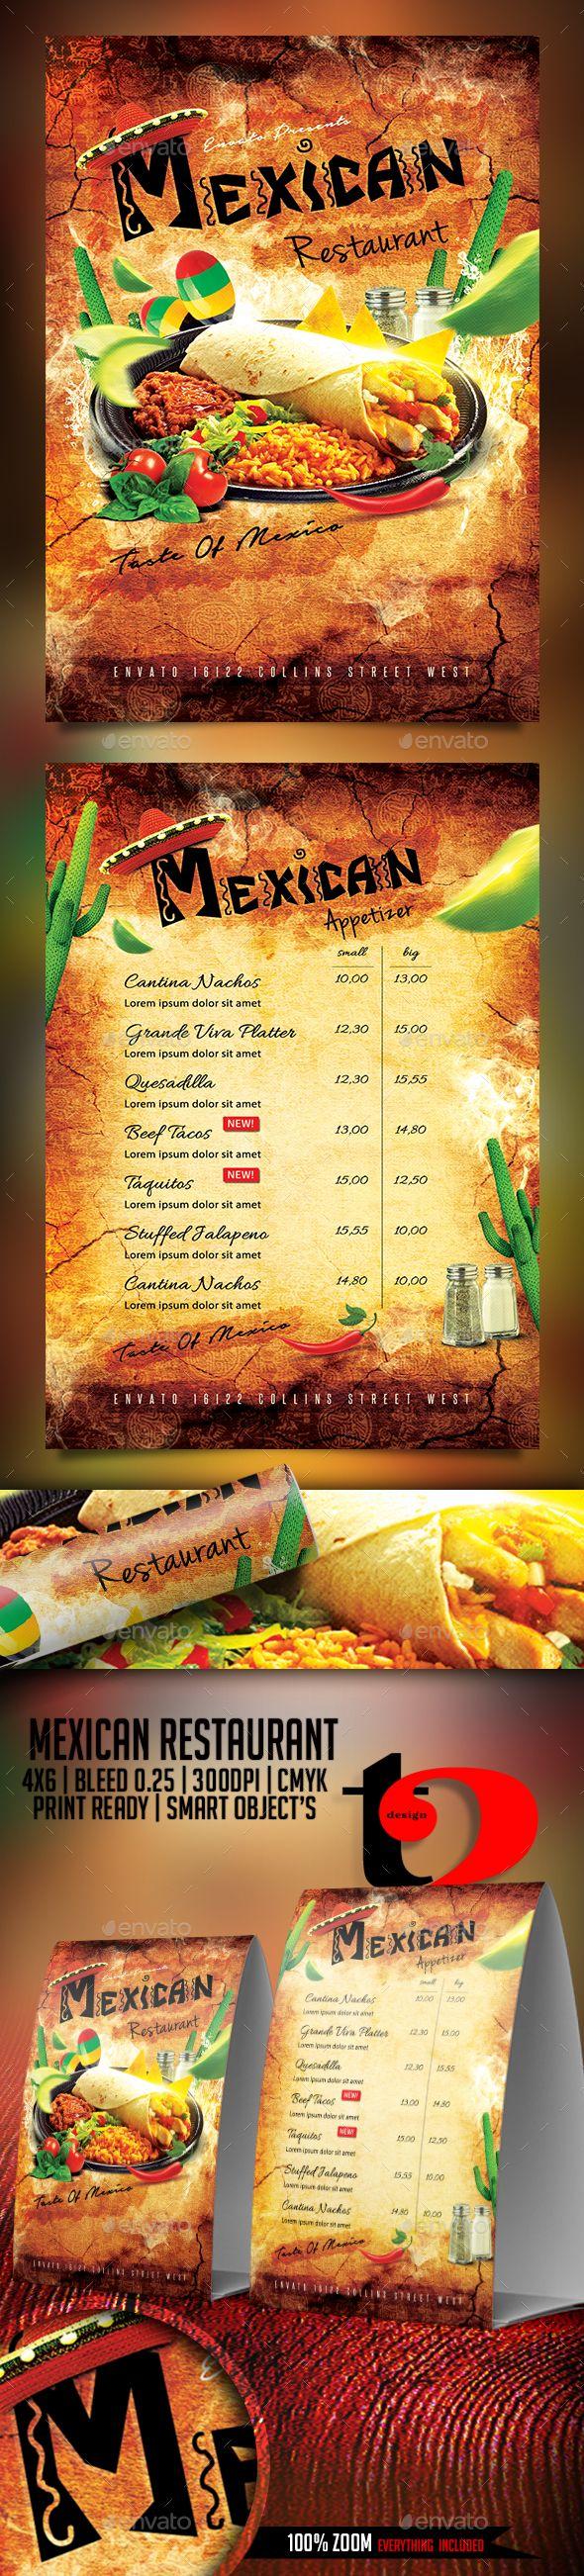 Mexican Restaurant Flyer Template | Restaurante, Restaurantes ...